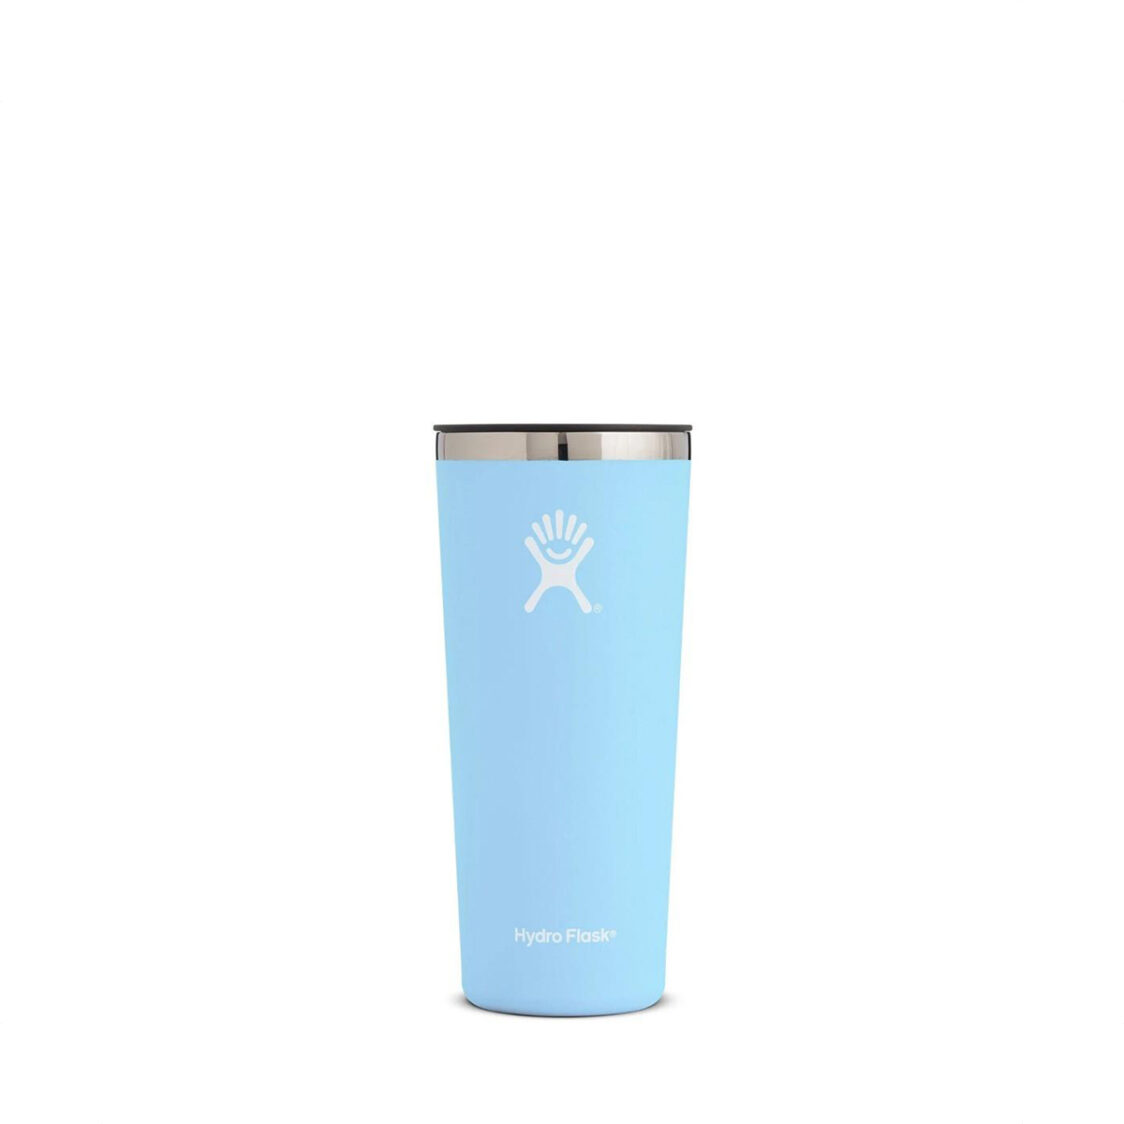 Hydro Flask Tumbler 22oz Frost